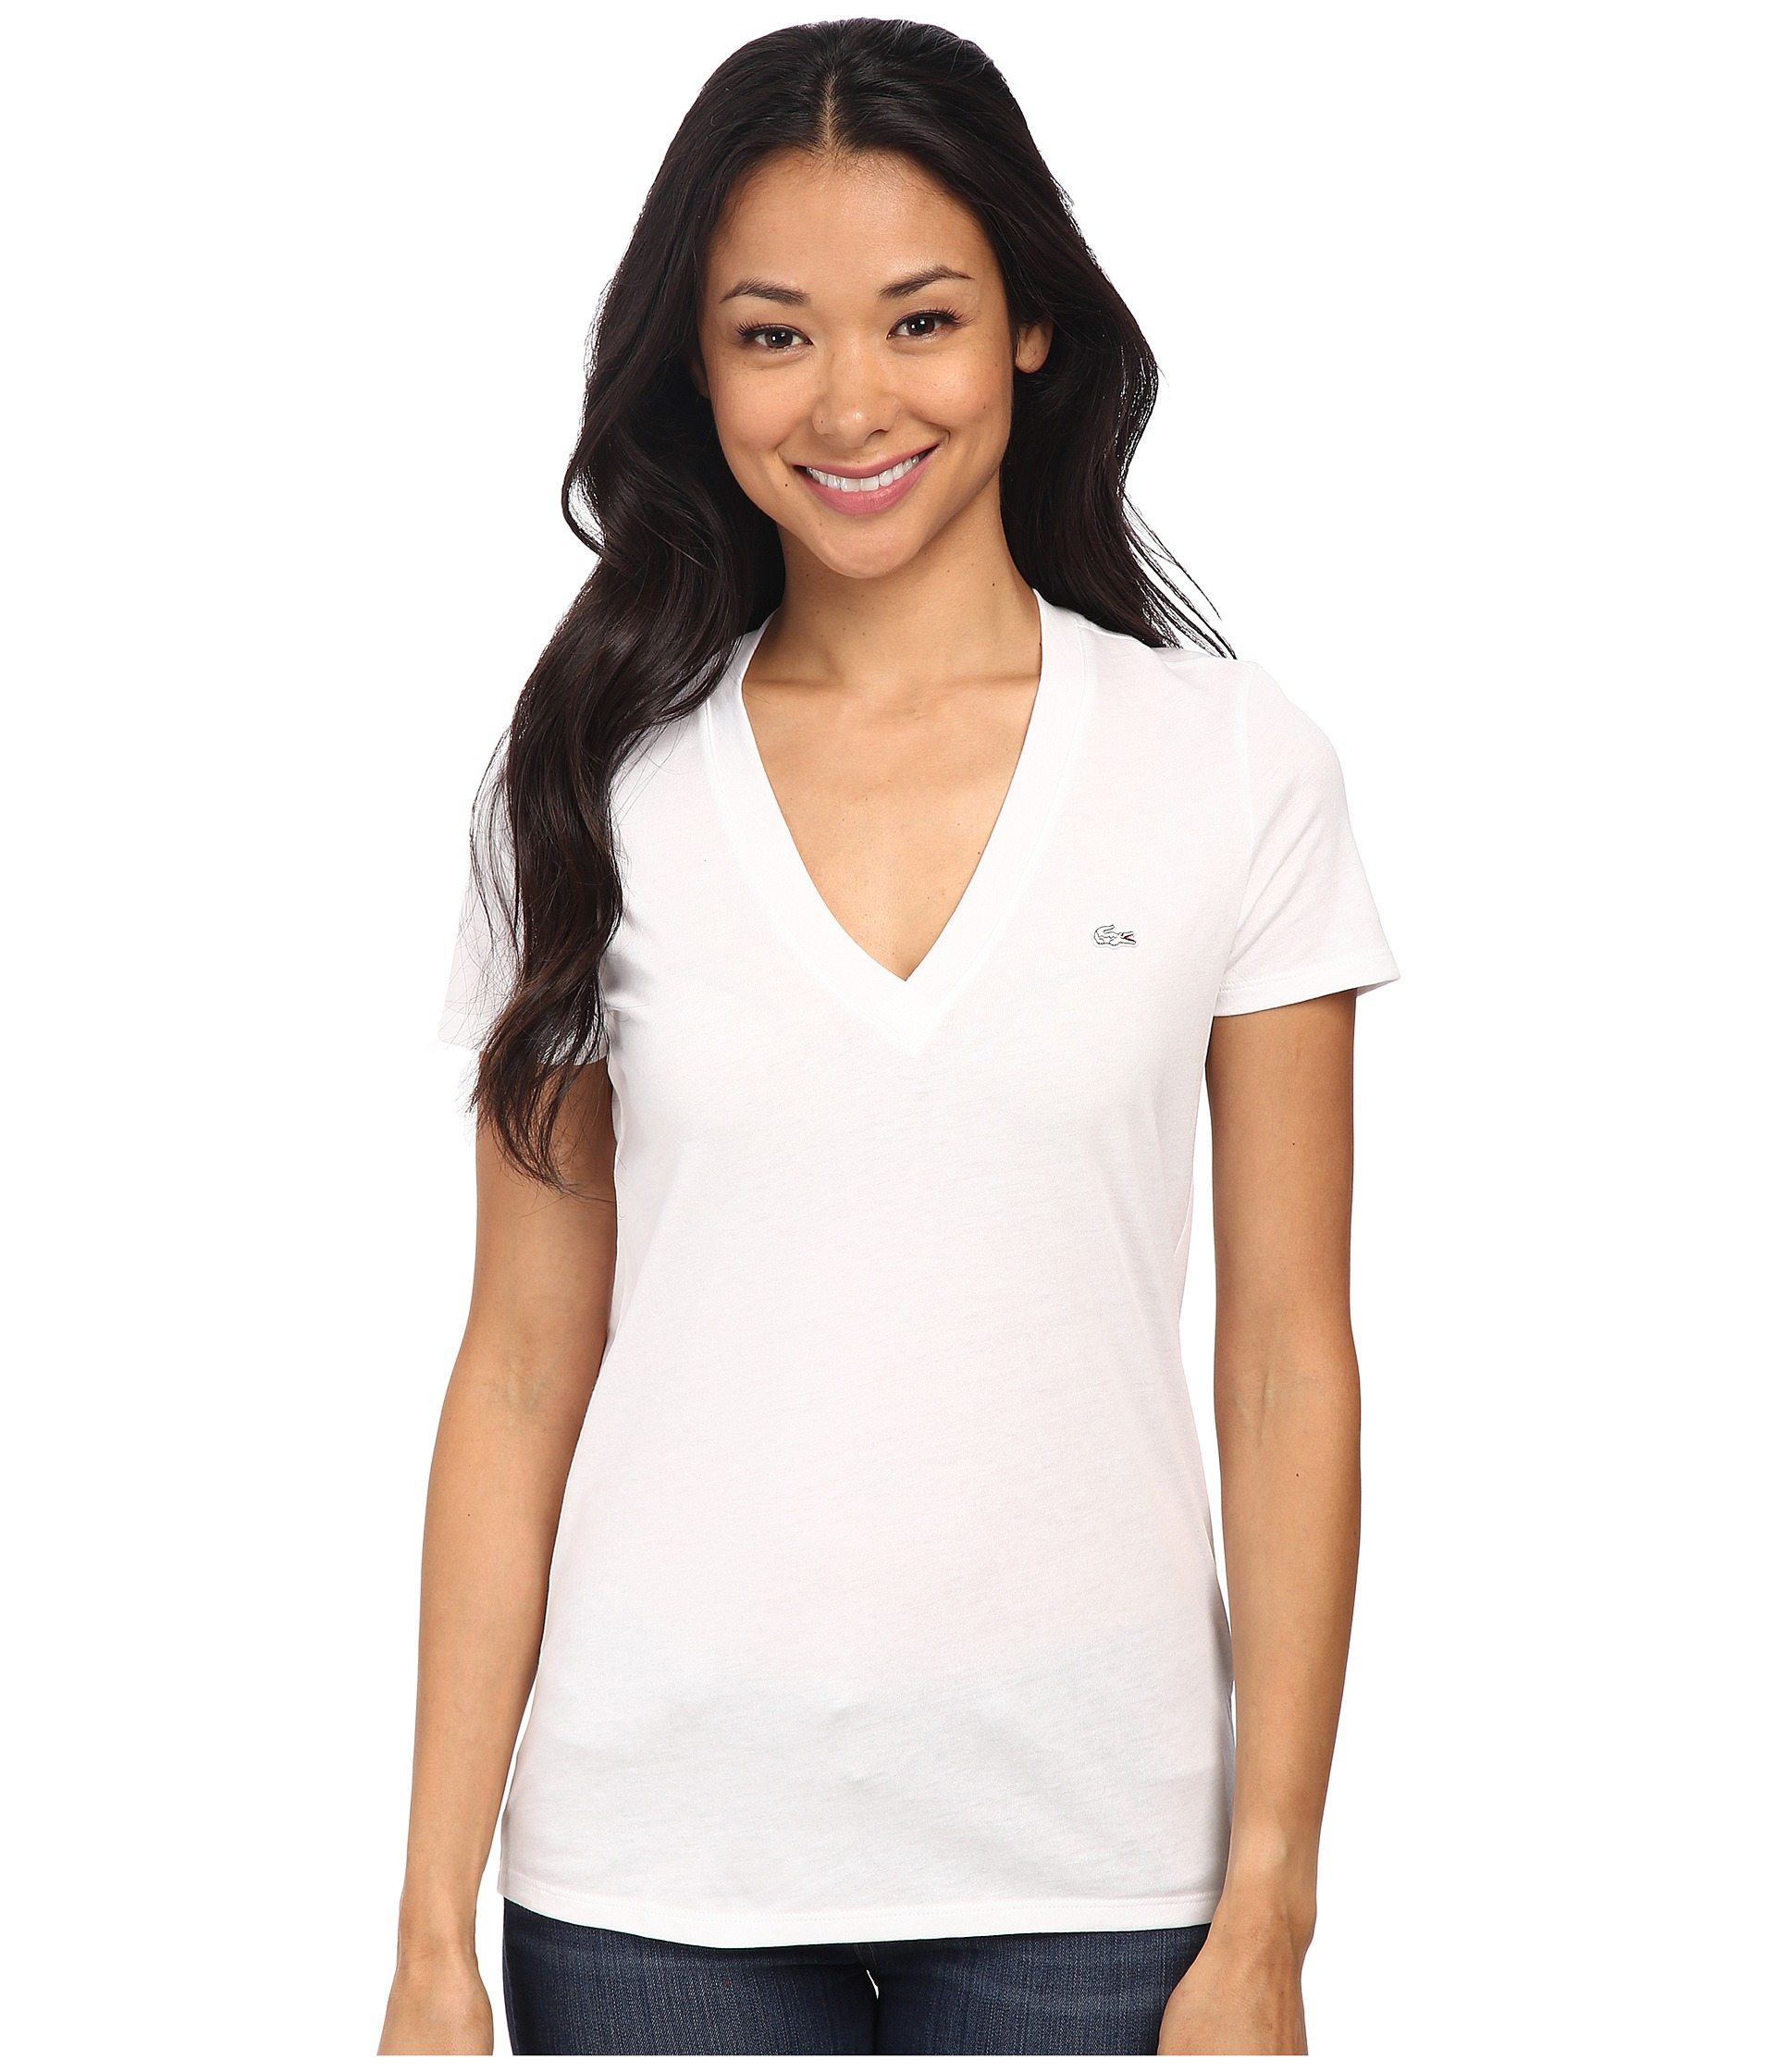 lacoste short sleeve cotton jersey v neck tee shirt white. Black Bedroom Furniture Sets. Home Design Ideas